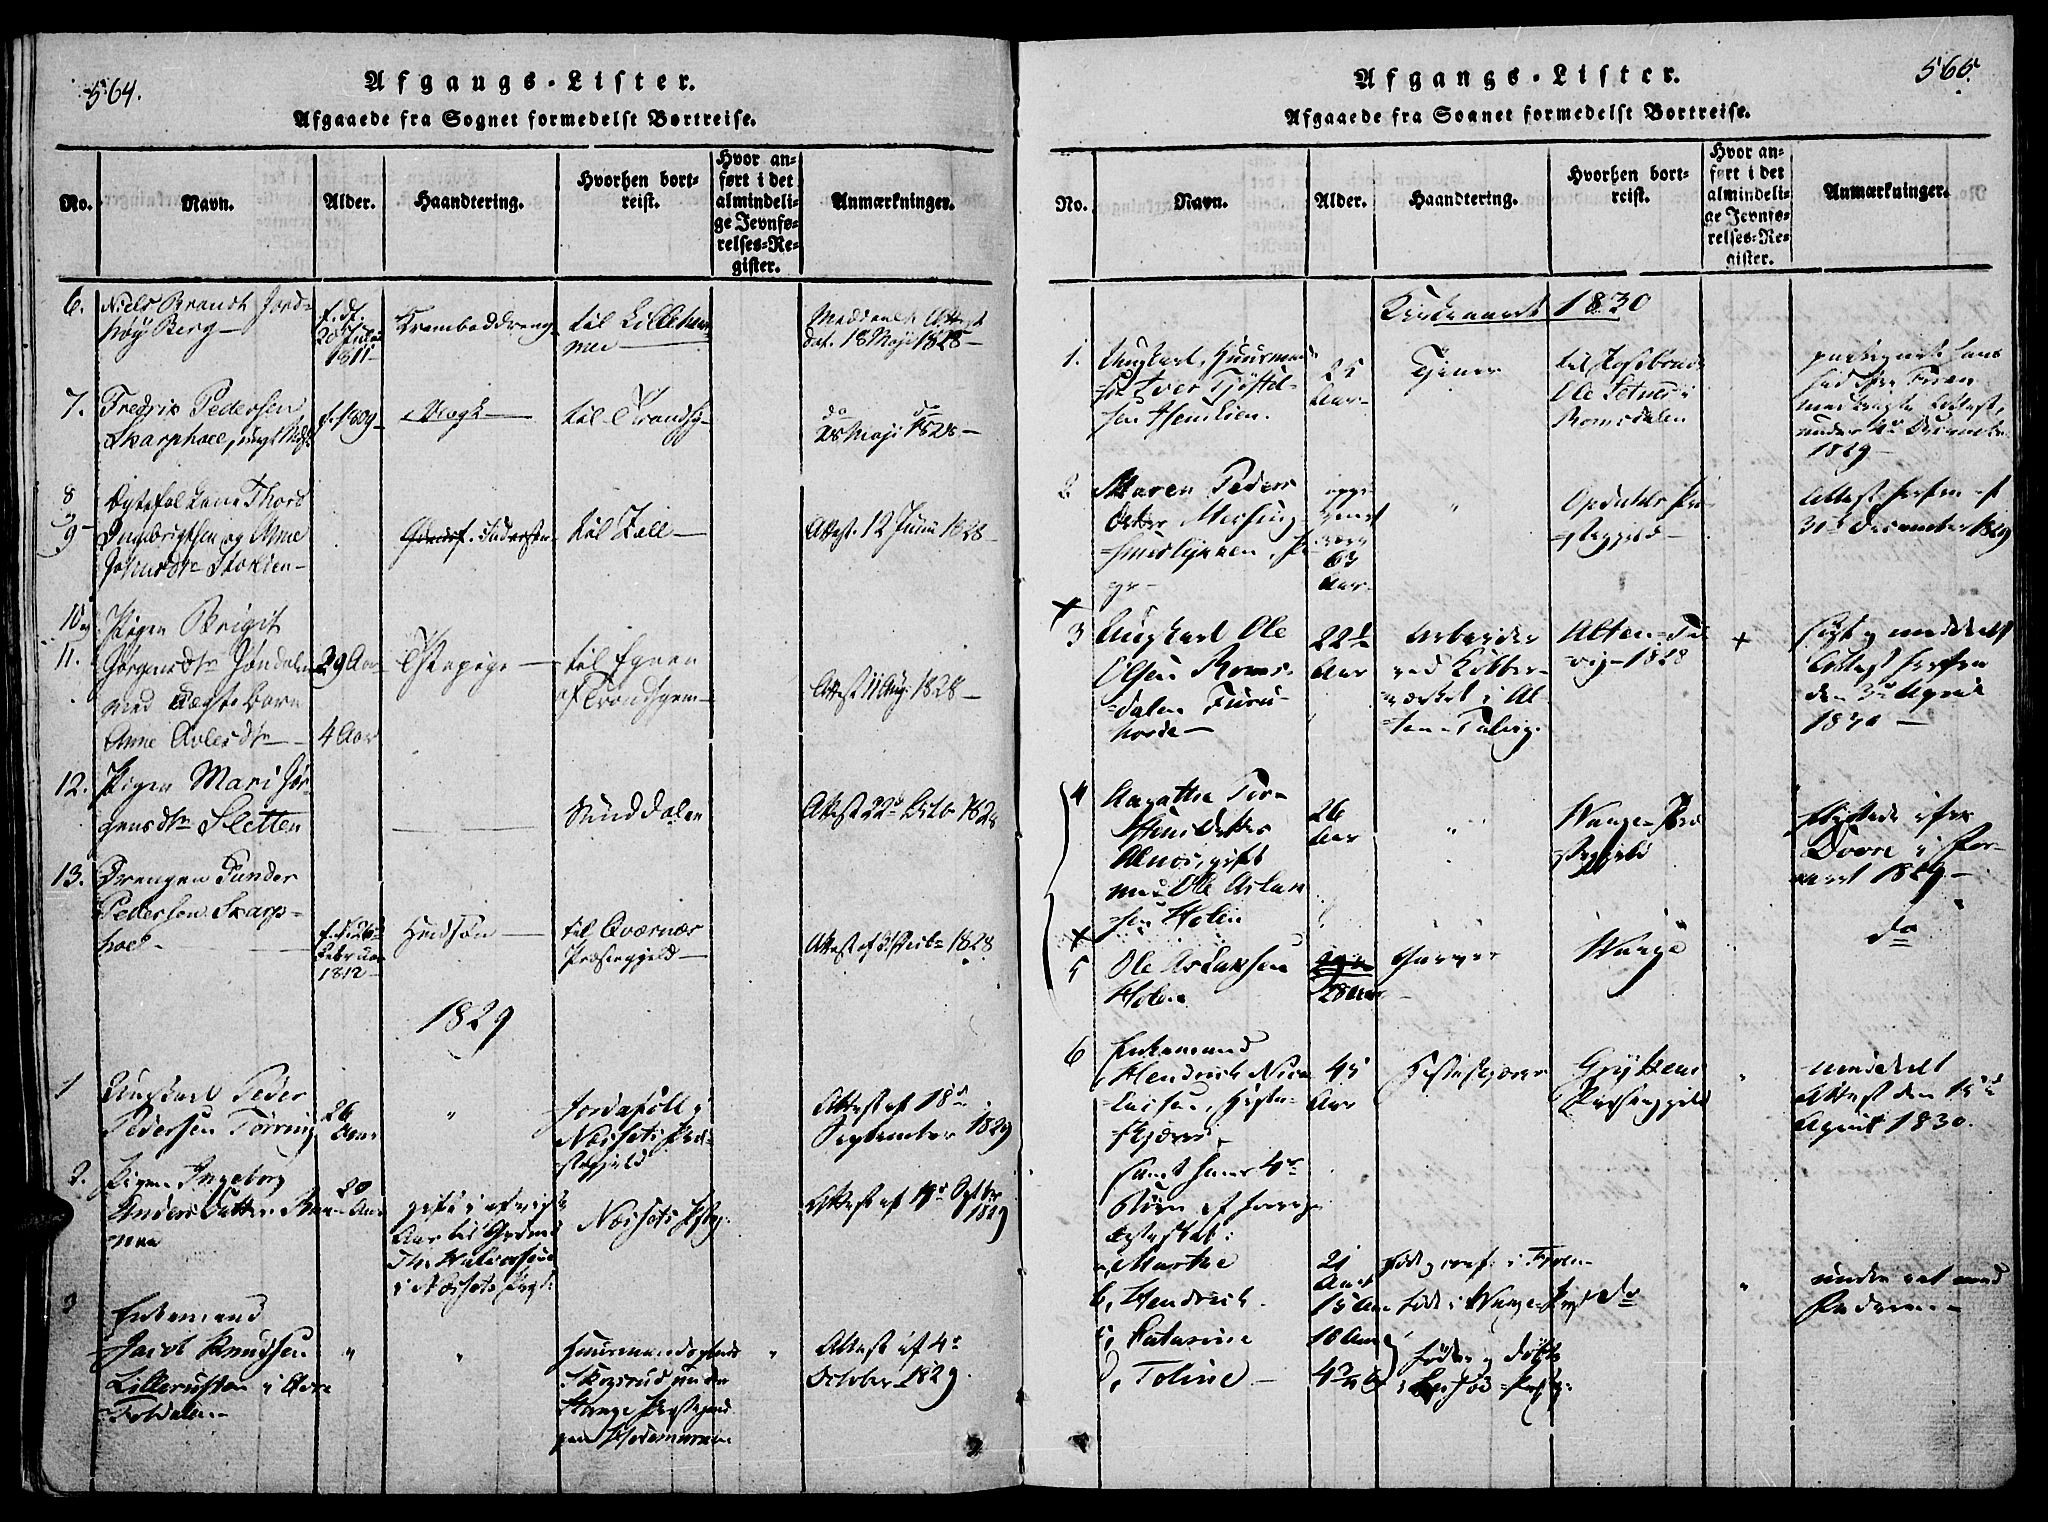 SAH, Lesja prestekontor, Ministerialbok nr. 4, 1820-1829, s. 564-565